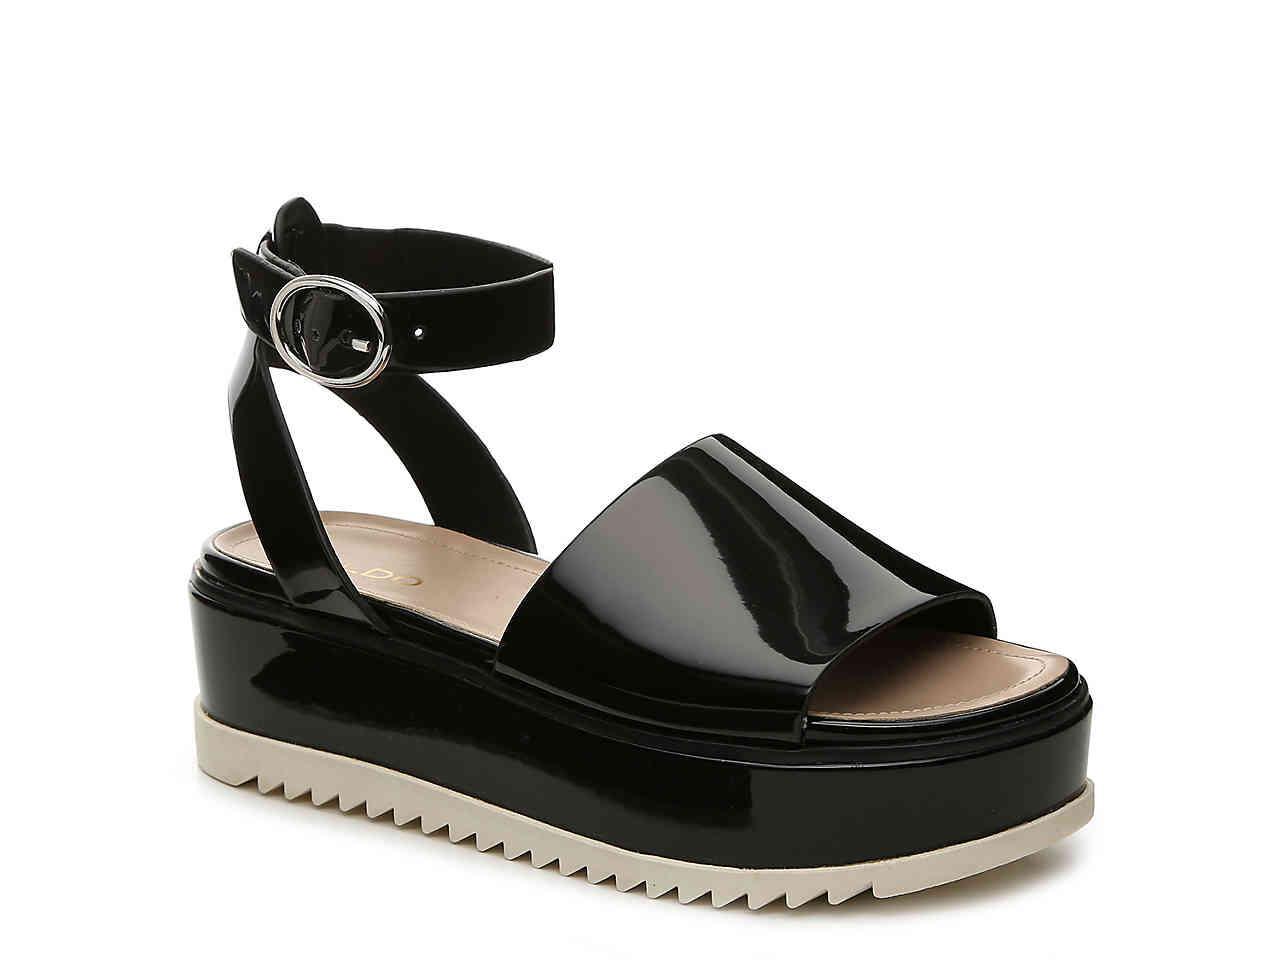 ALDO Leather Jadde Platform Sandal in